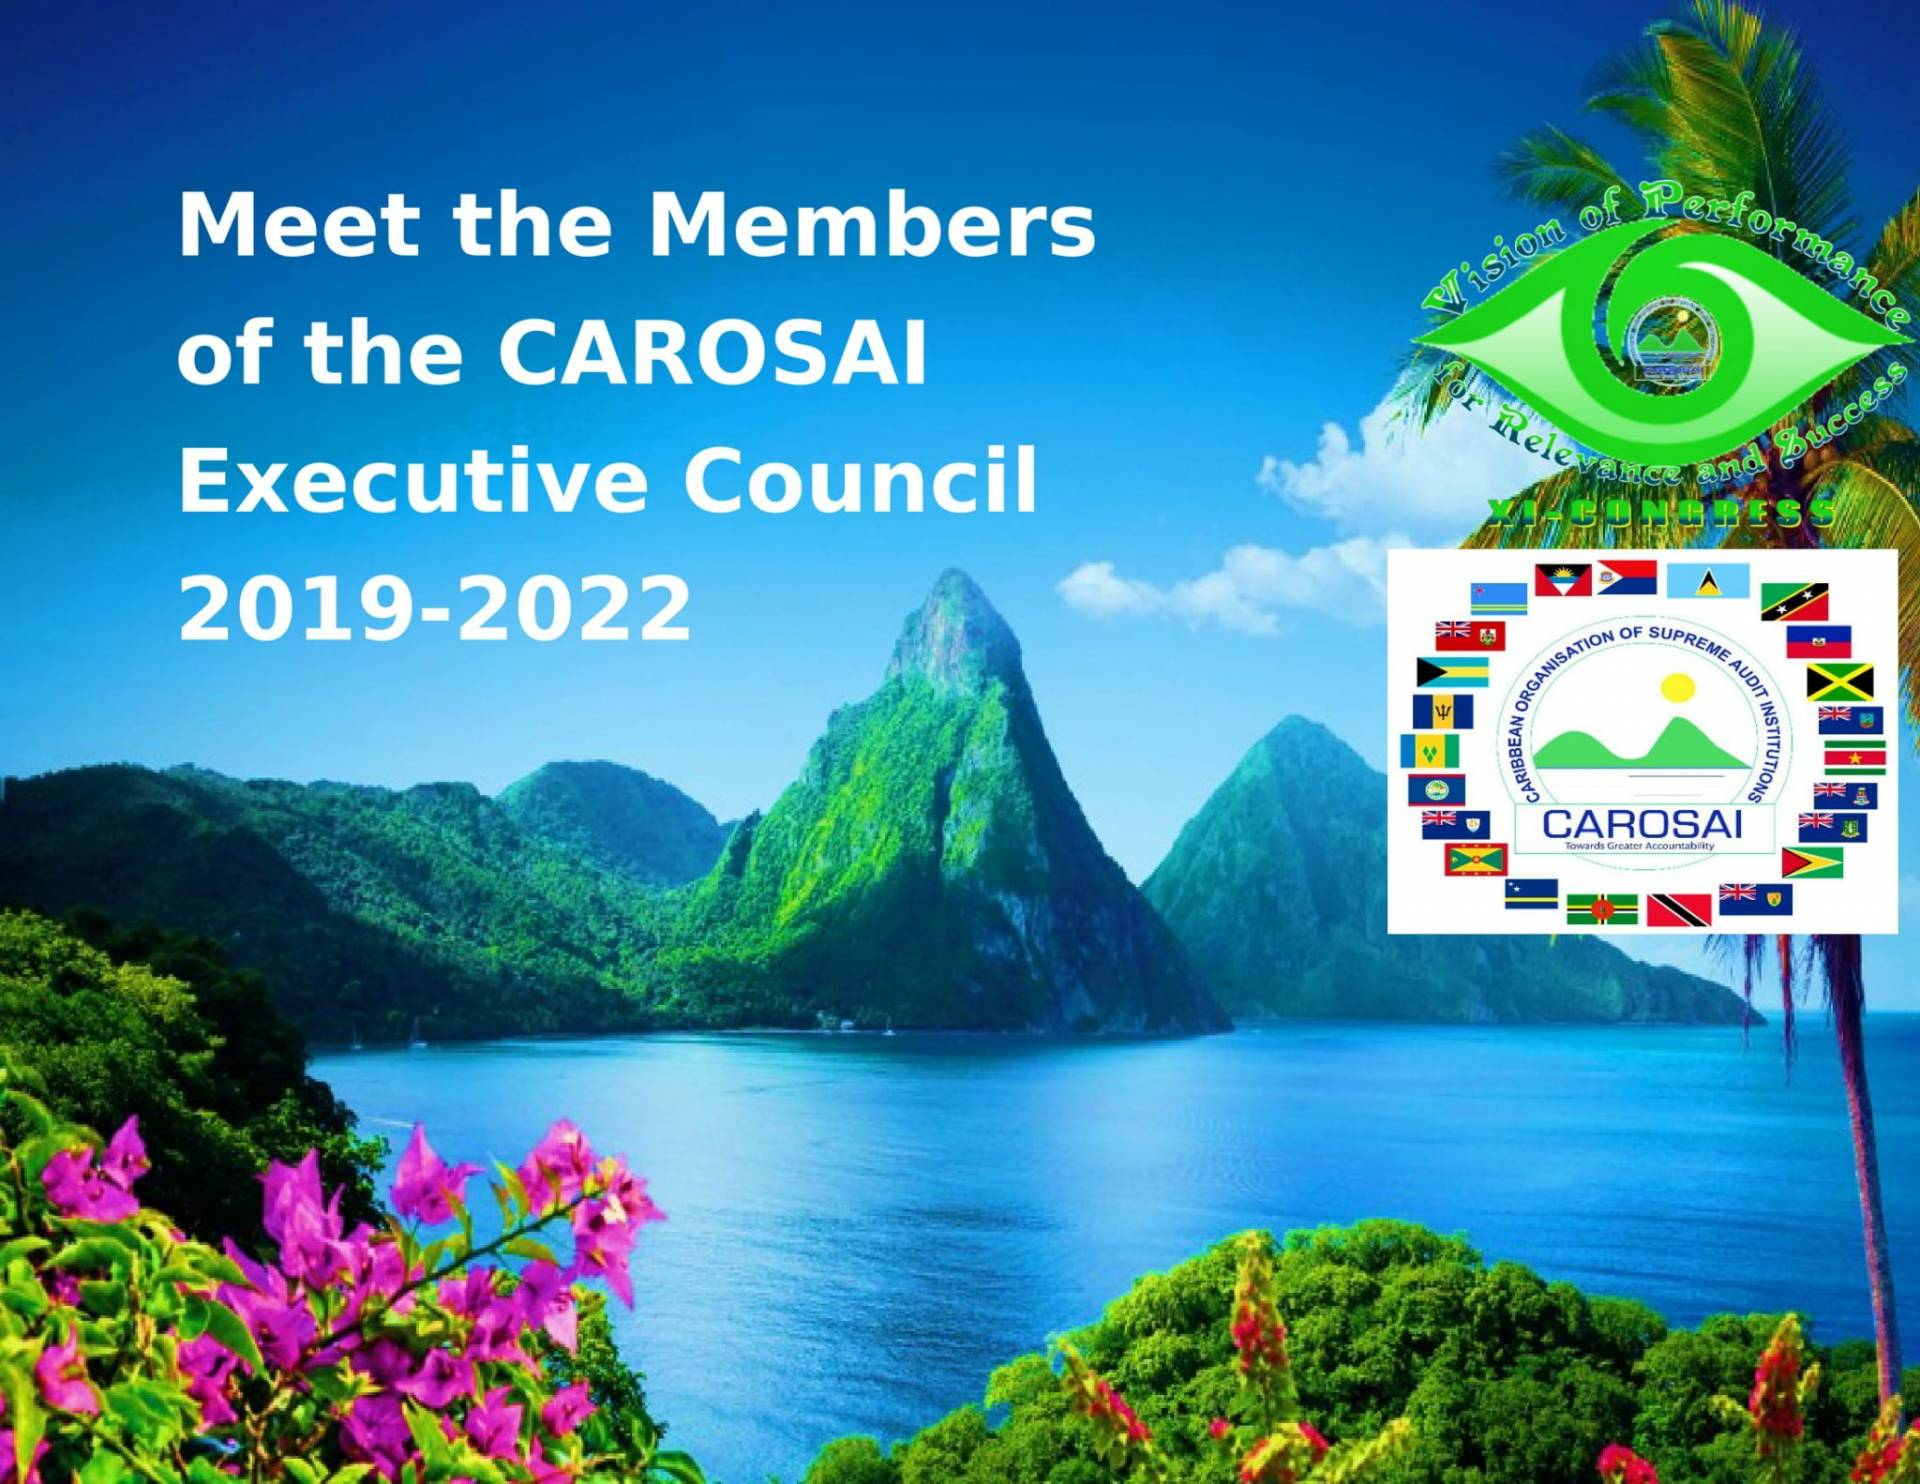 Meet the Members of CAROSAI's Executive Council- 2019 to 2022